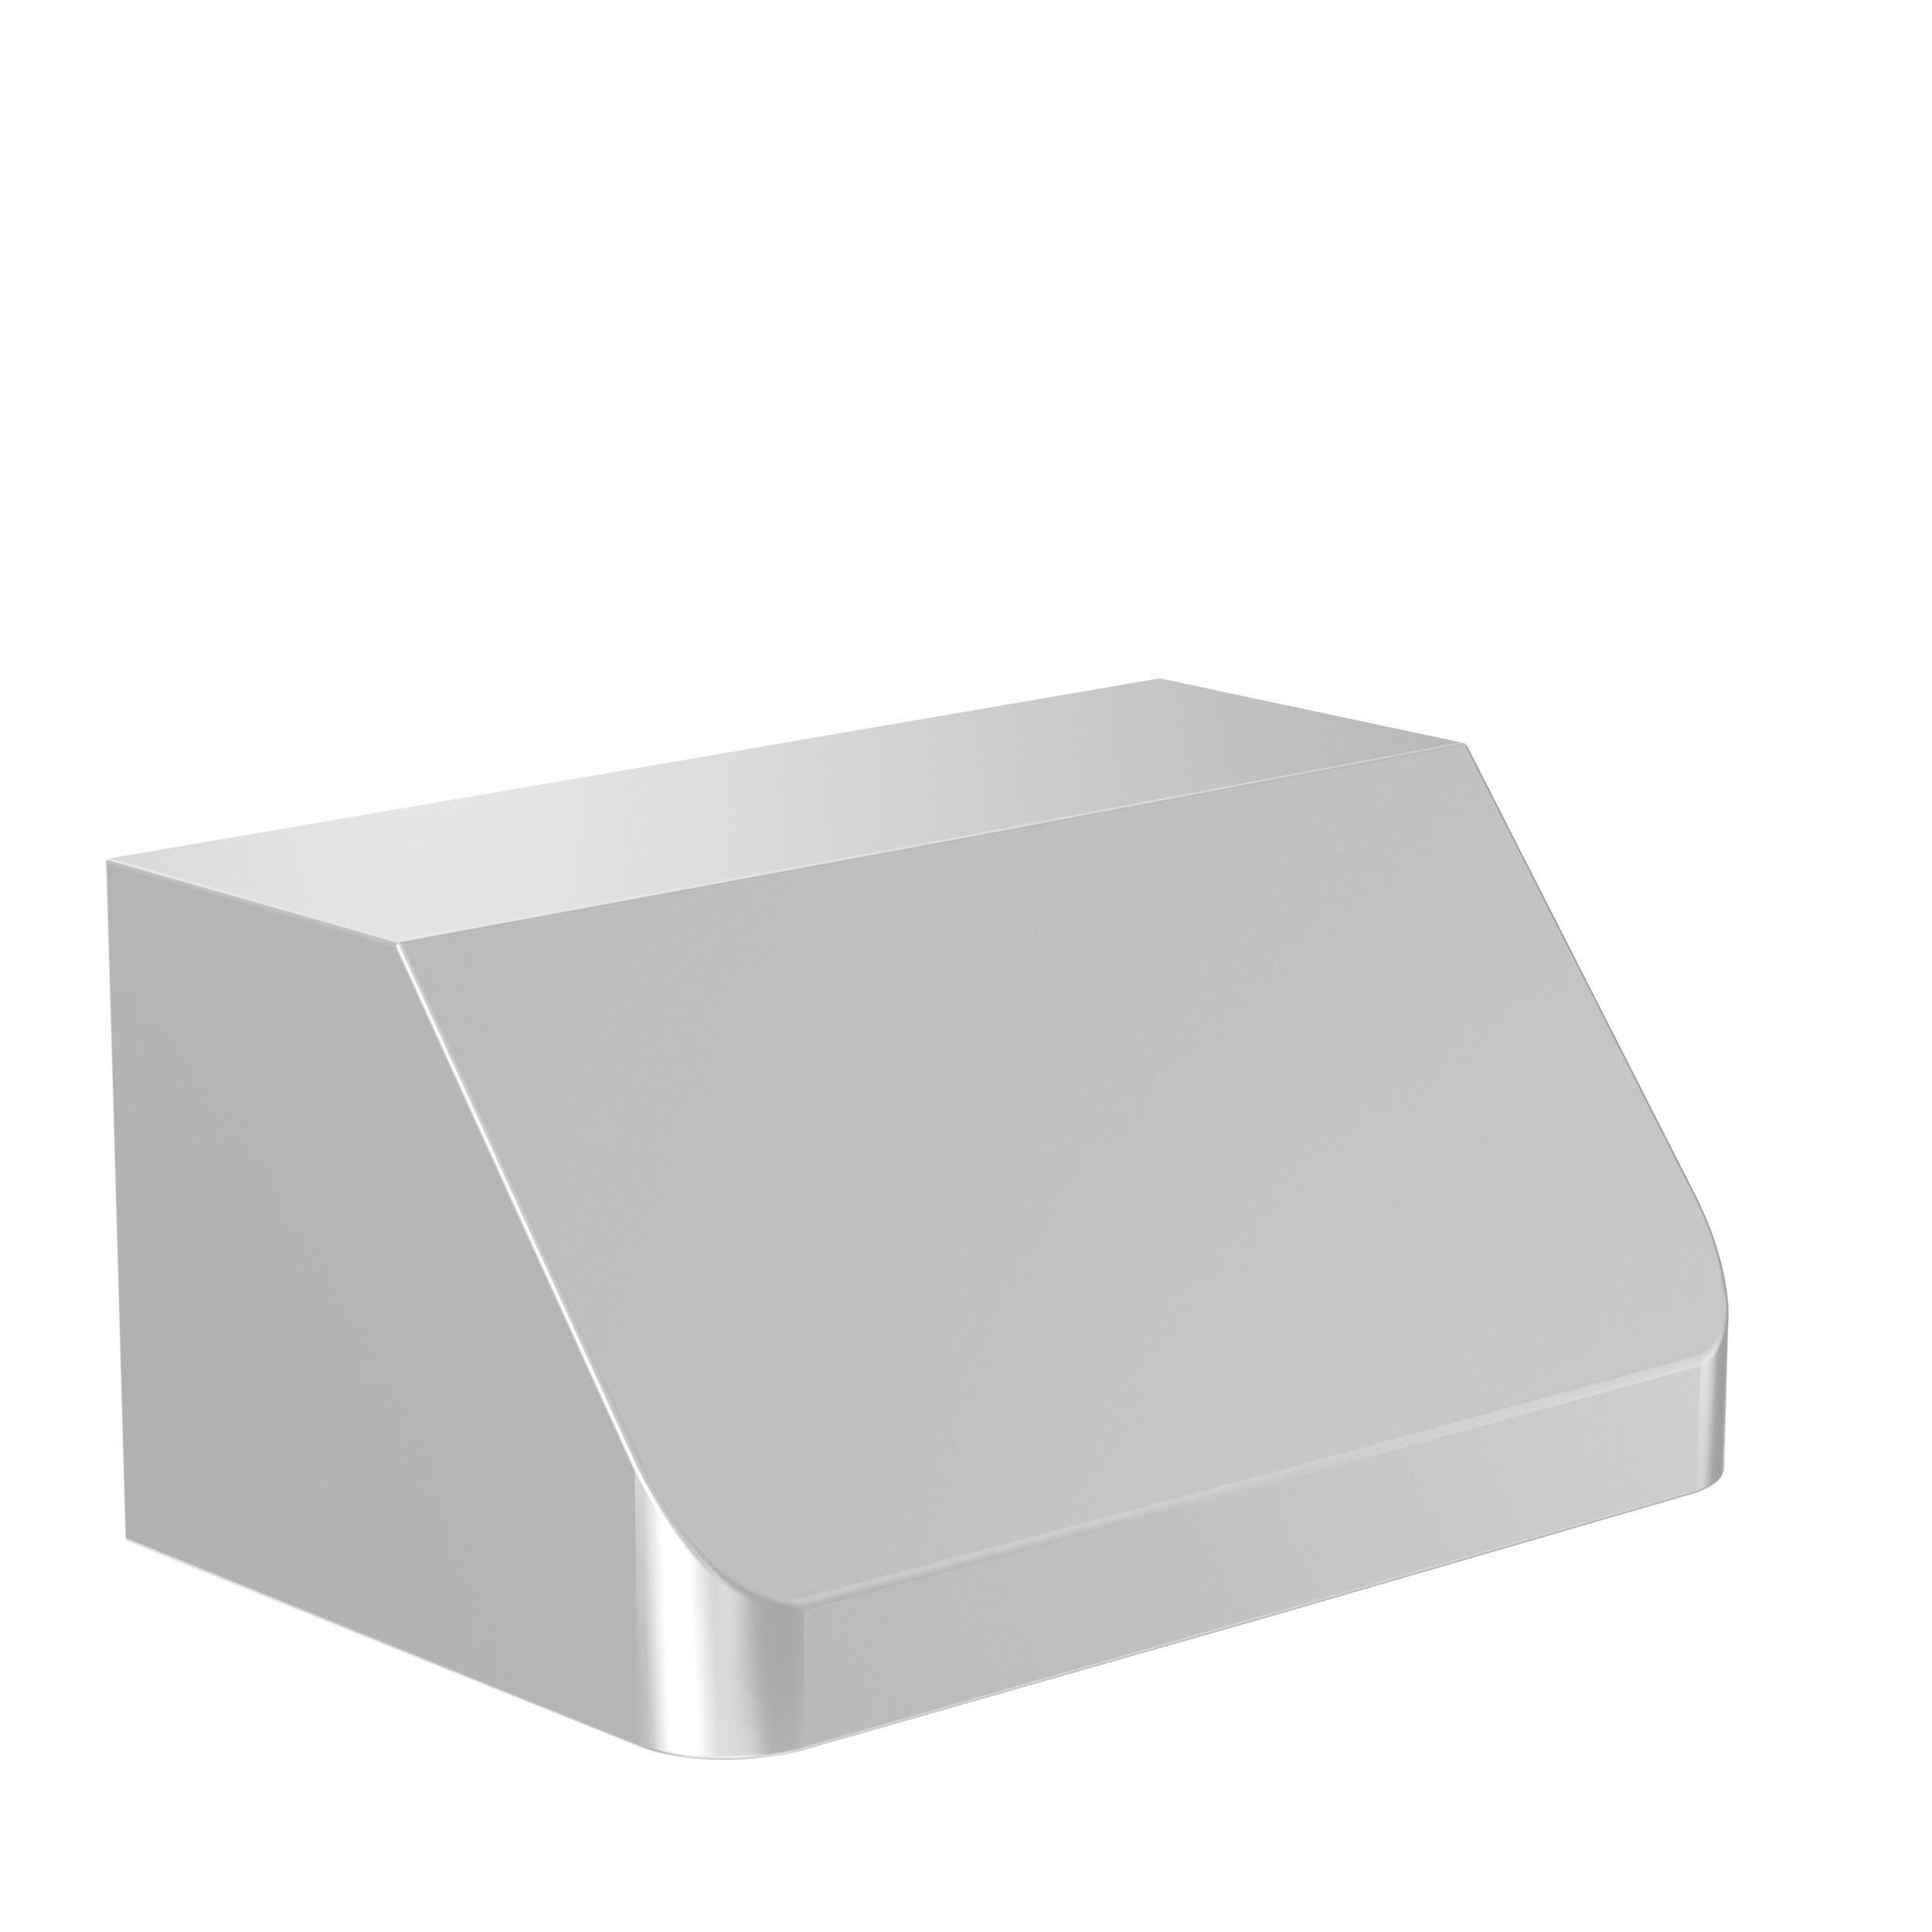 zline-stainless-steel-under-cabinet-range-hood-520-top.jpeg